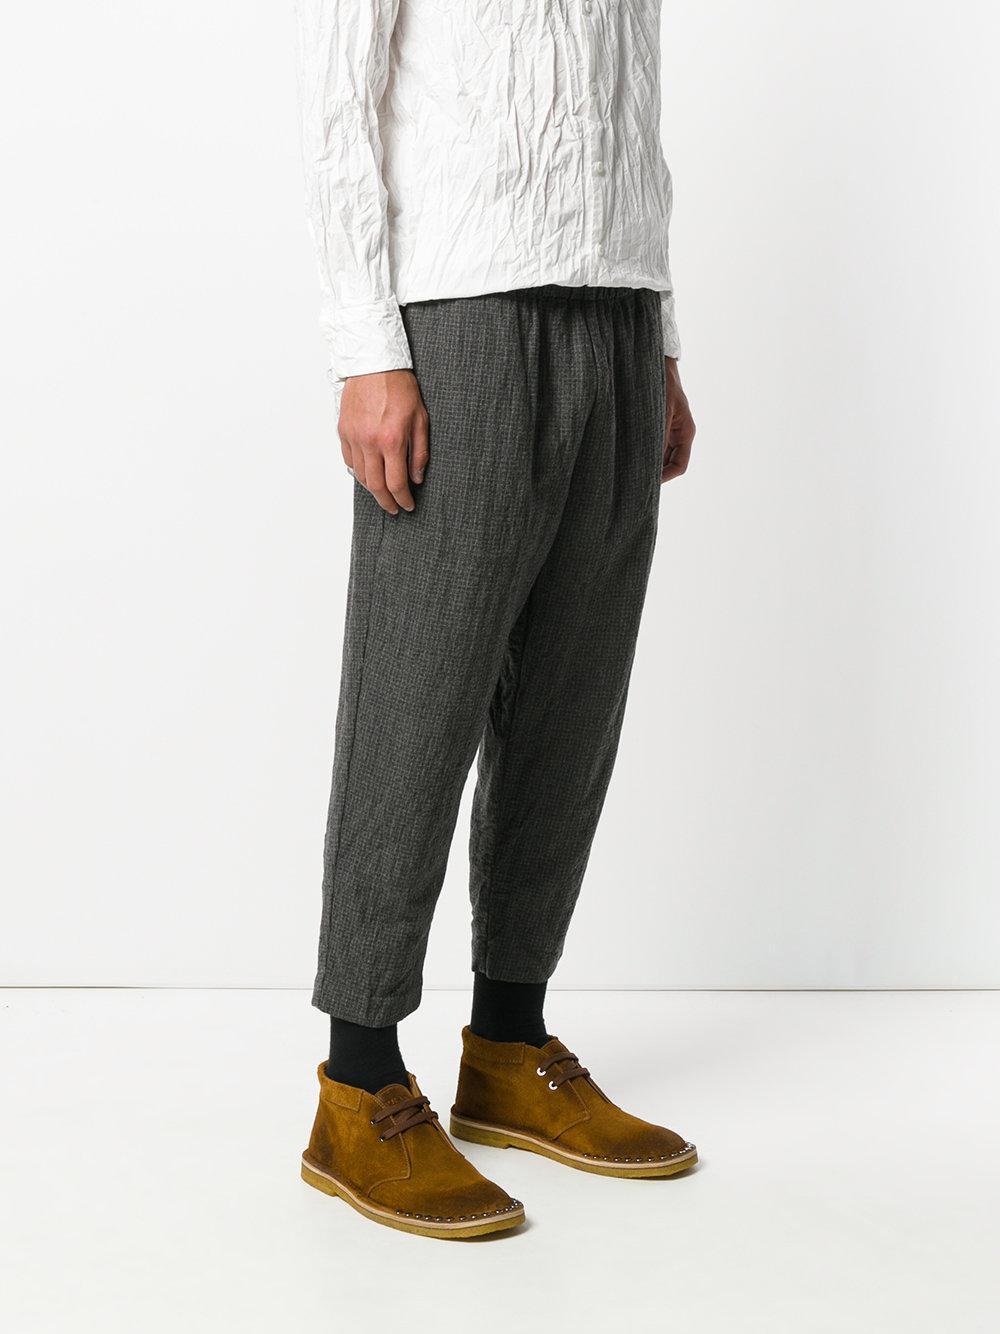 Casey Casey Wool Zwag 2 Trousers in Grey (Grey) for Men